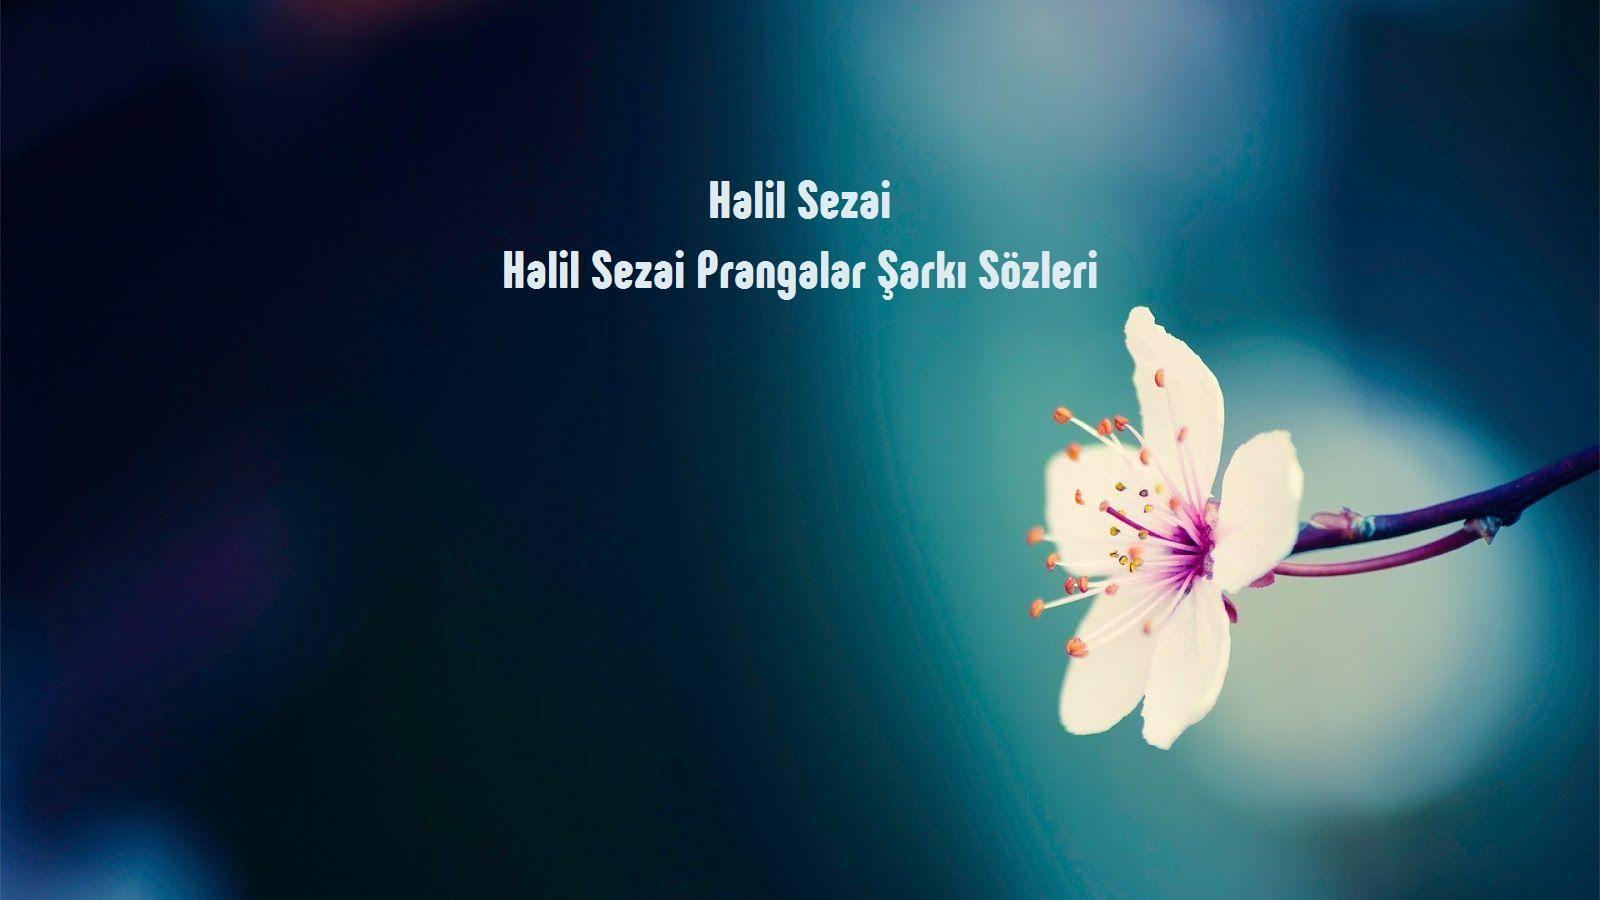 Halil Sezai Prangalar sözleri http://sarki-sozleri.web.tr/prangalar-sozleri/